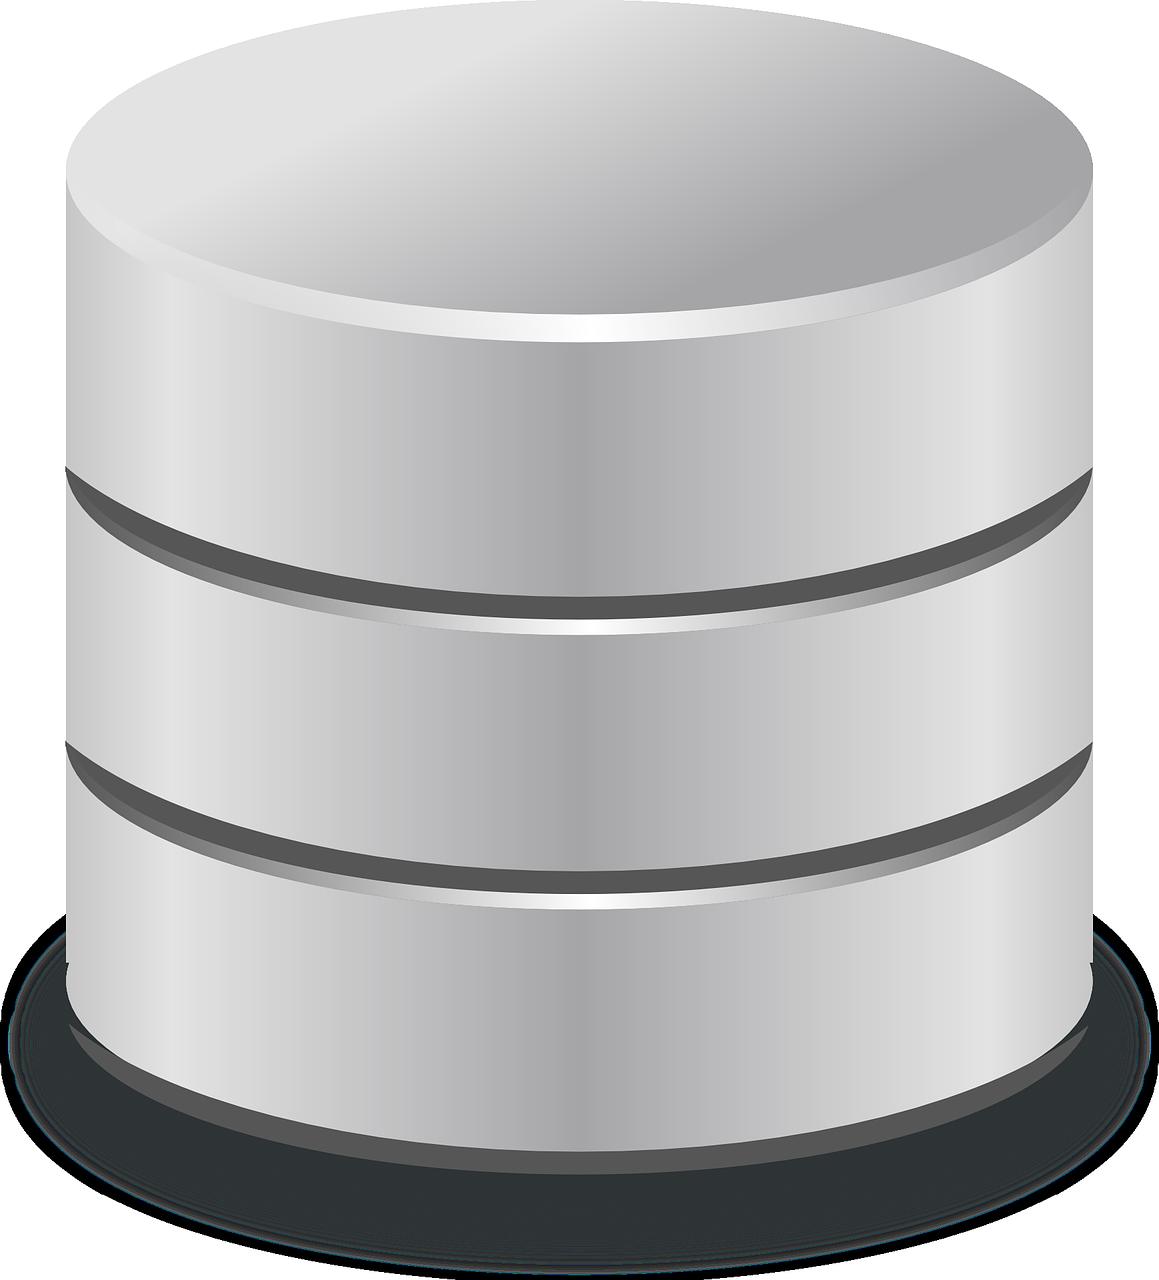 learningdatabase.com.br